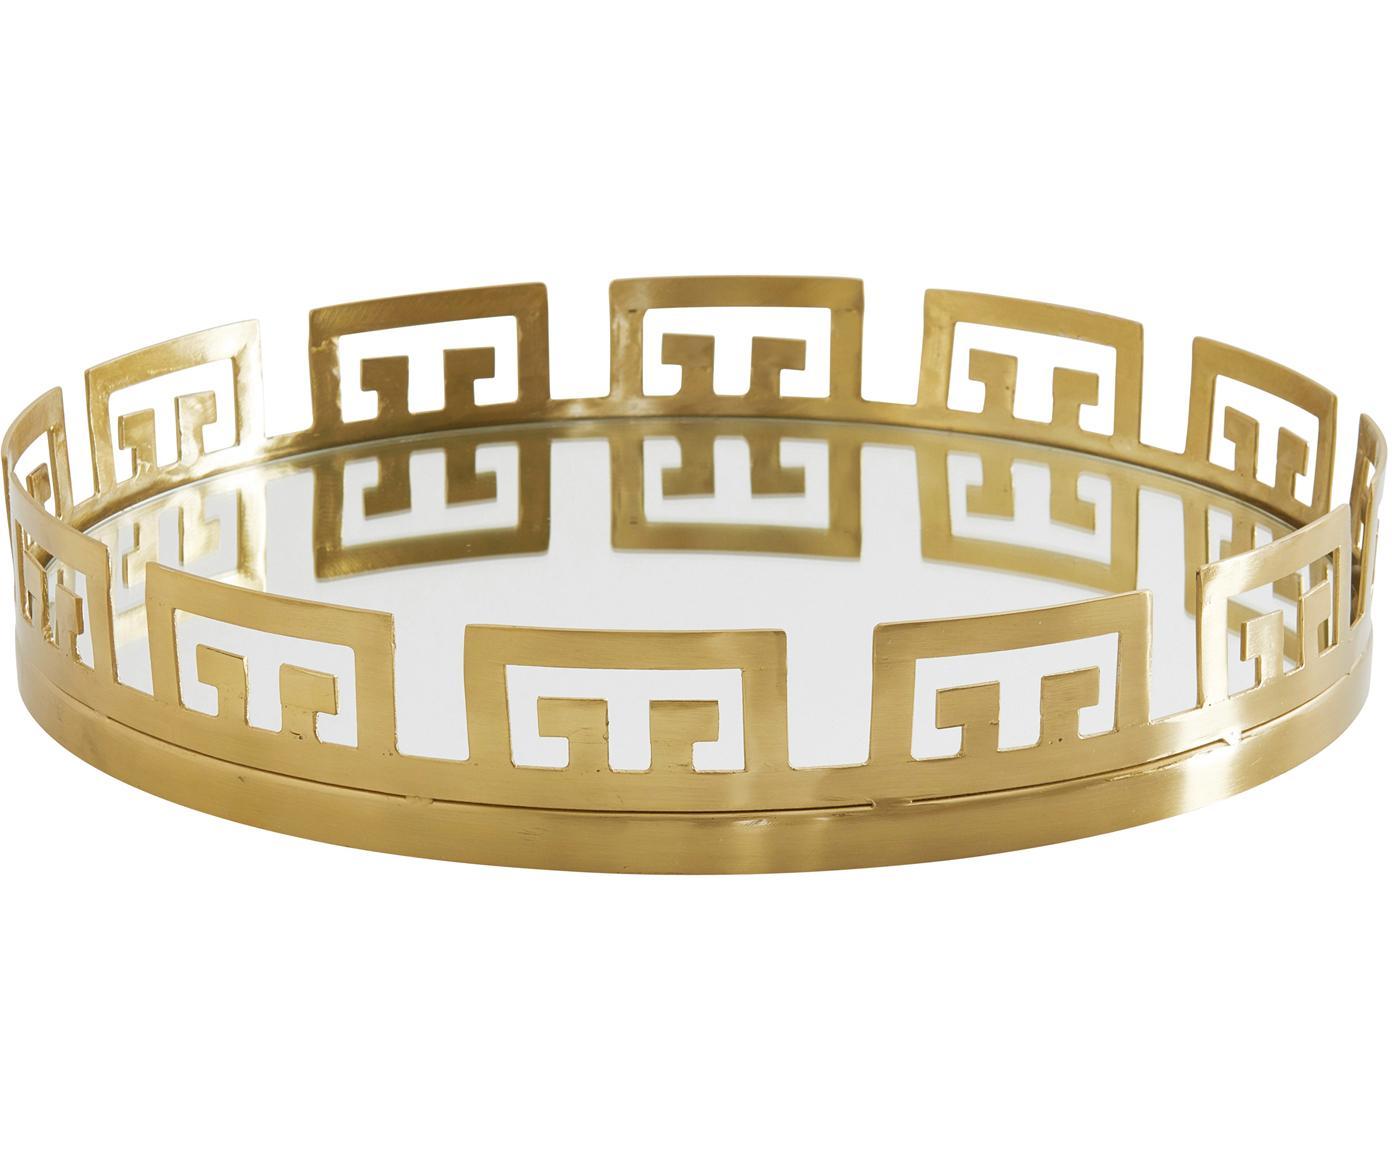 Vassoio Mallis, Cornice: metallo rivestito, Ottonato, lastra di vetro, Ø 42 cm